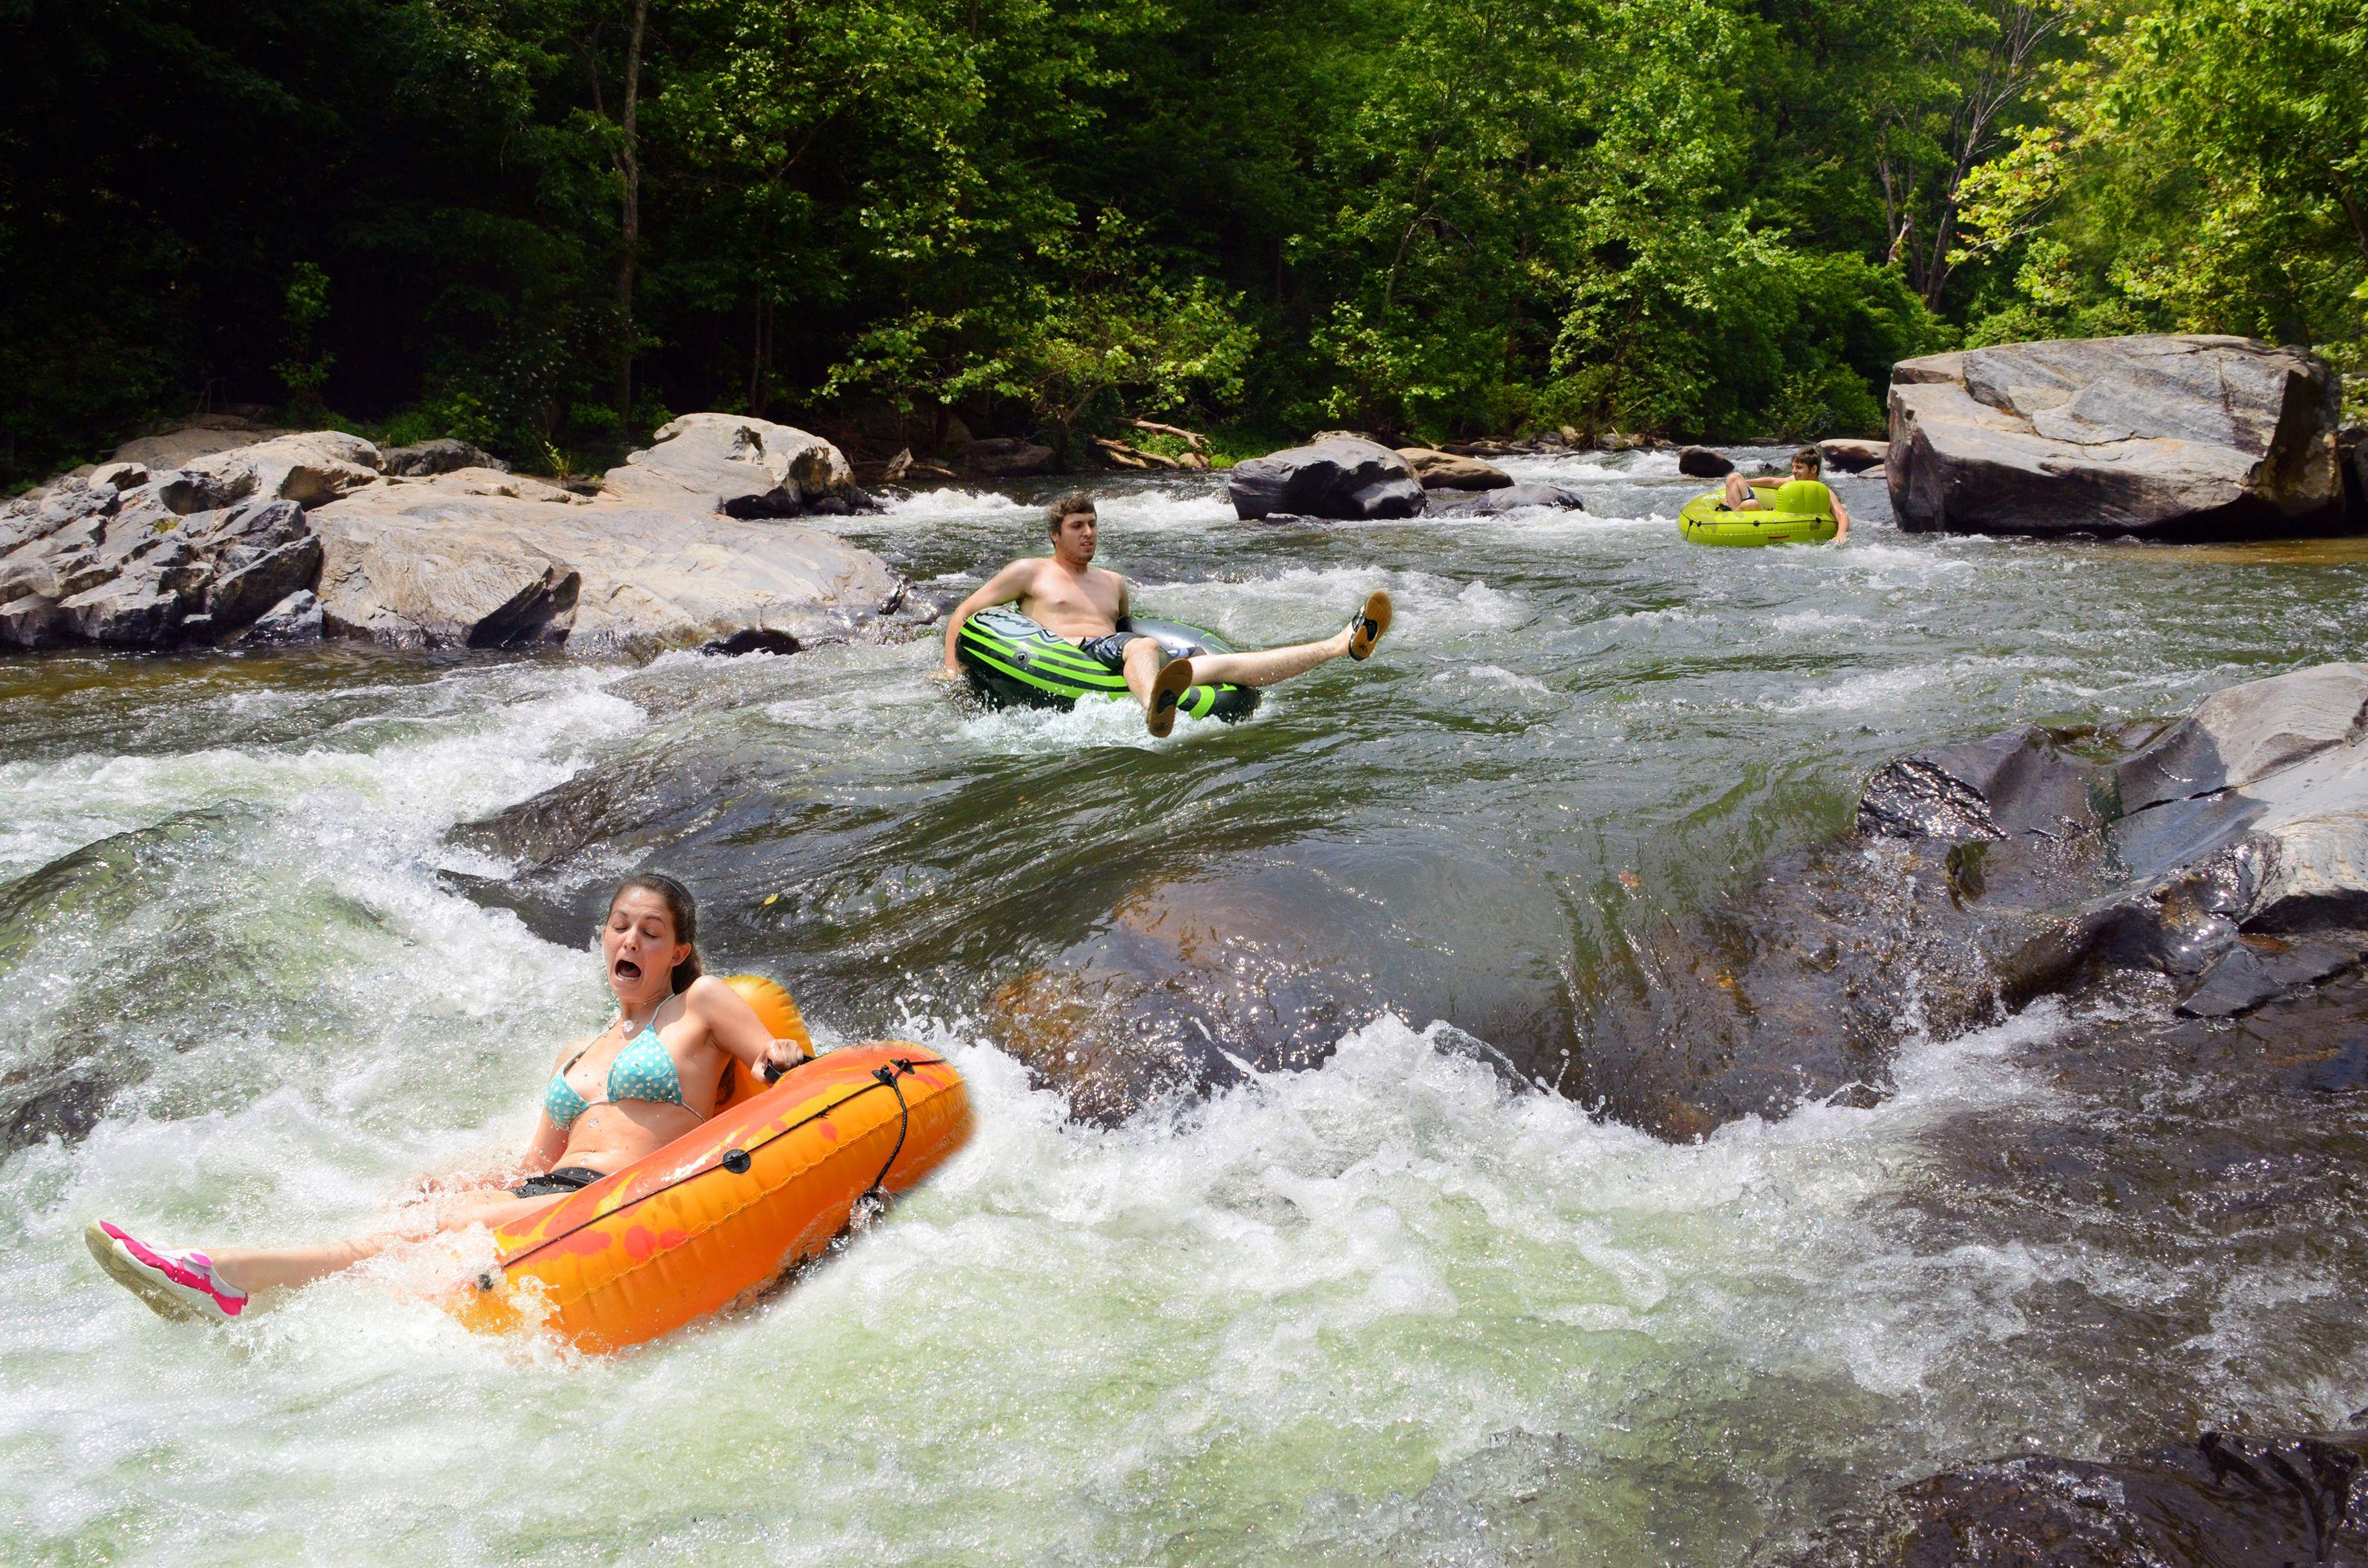 Gunpowder river pot rocks onehundred miles of trails